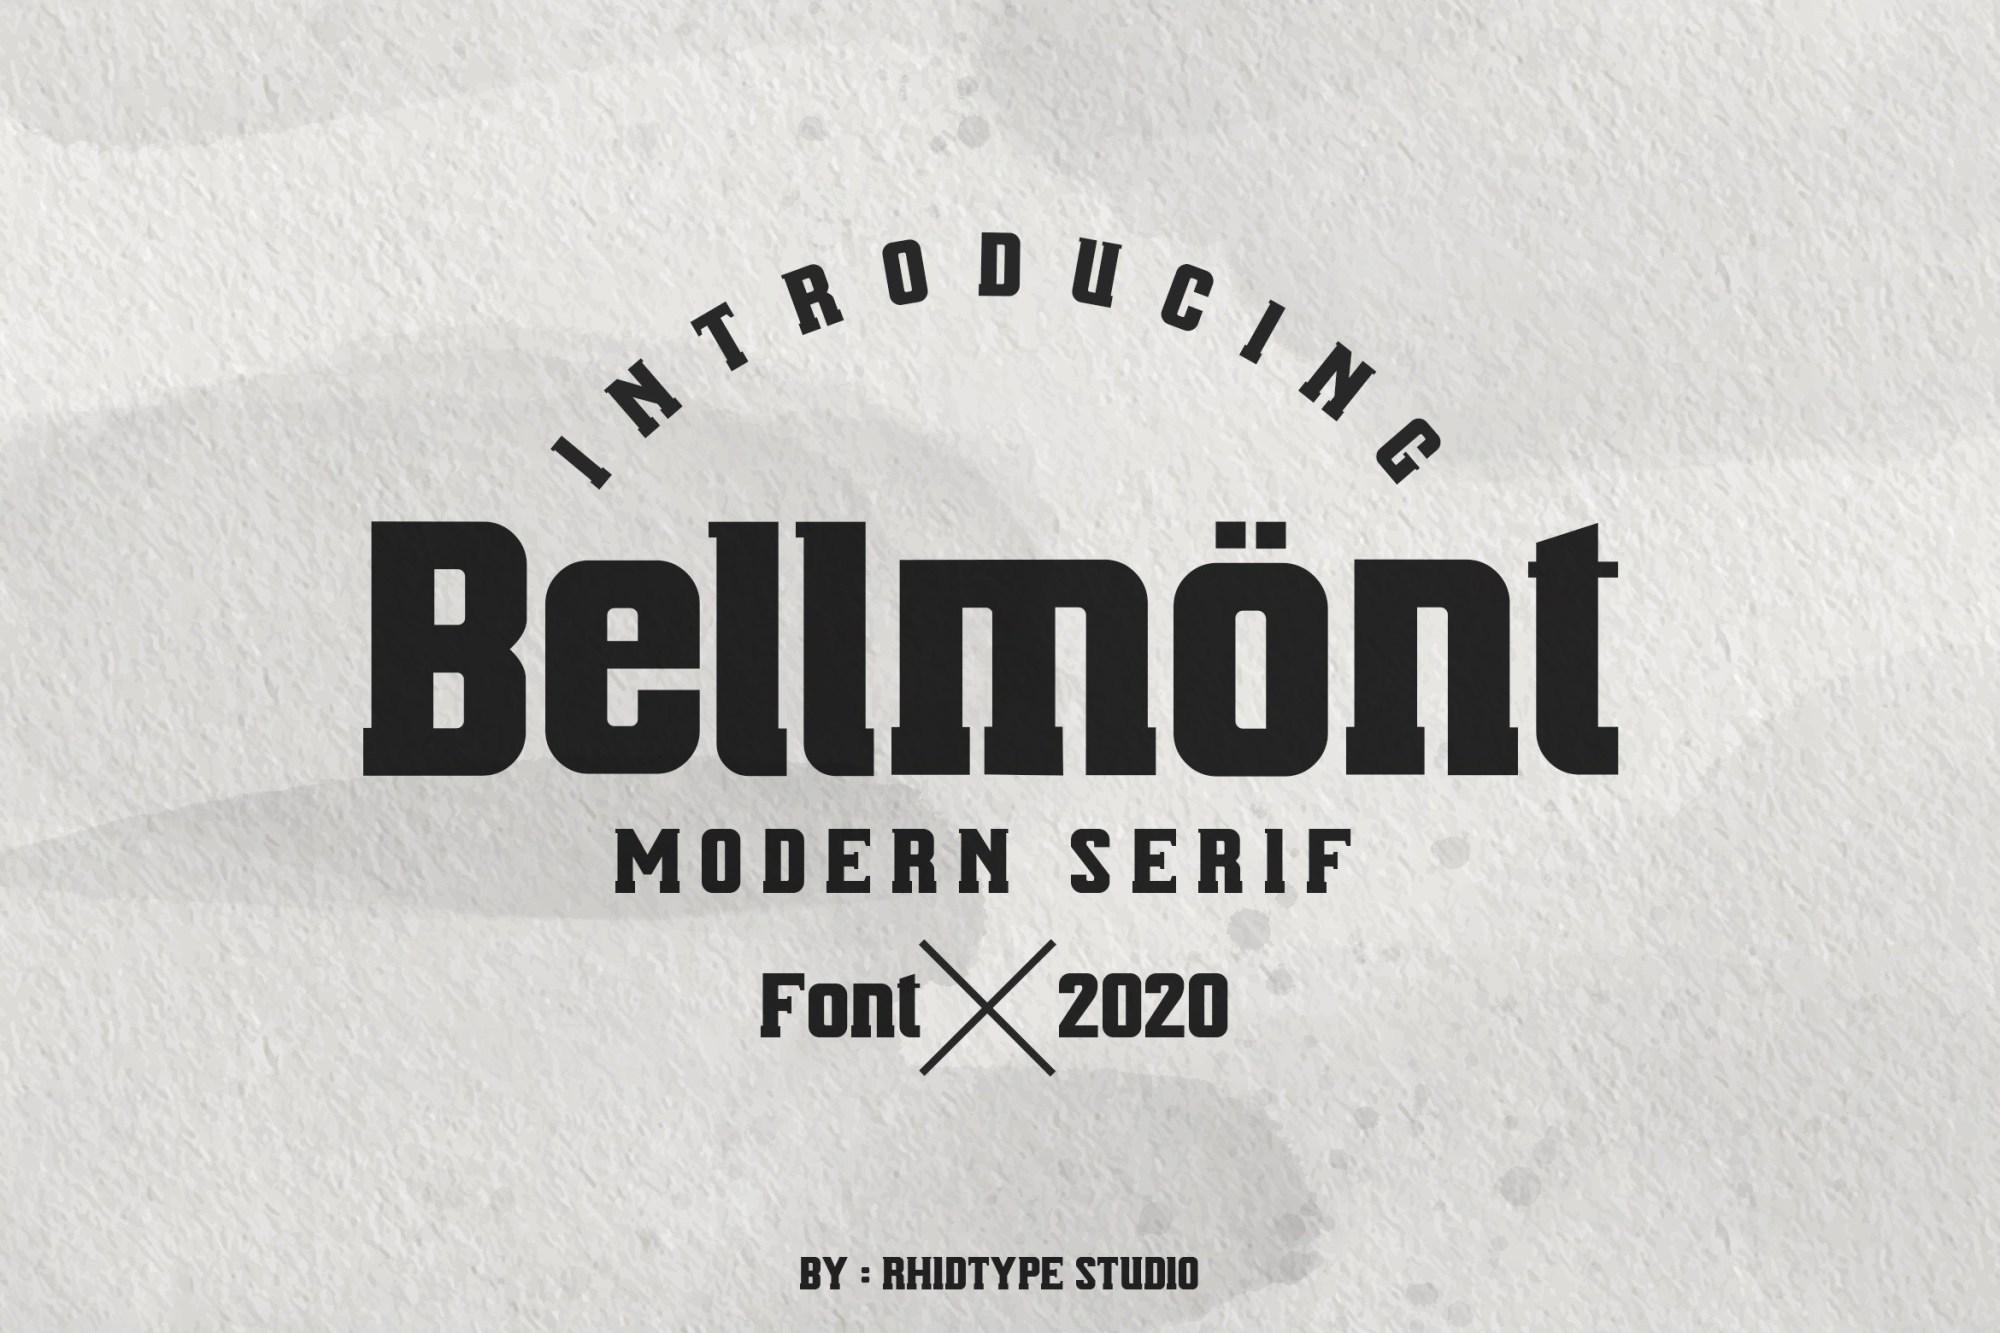 Bellmont-Modern-Serif-Typeface-1